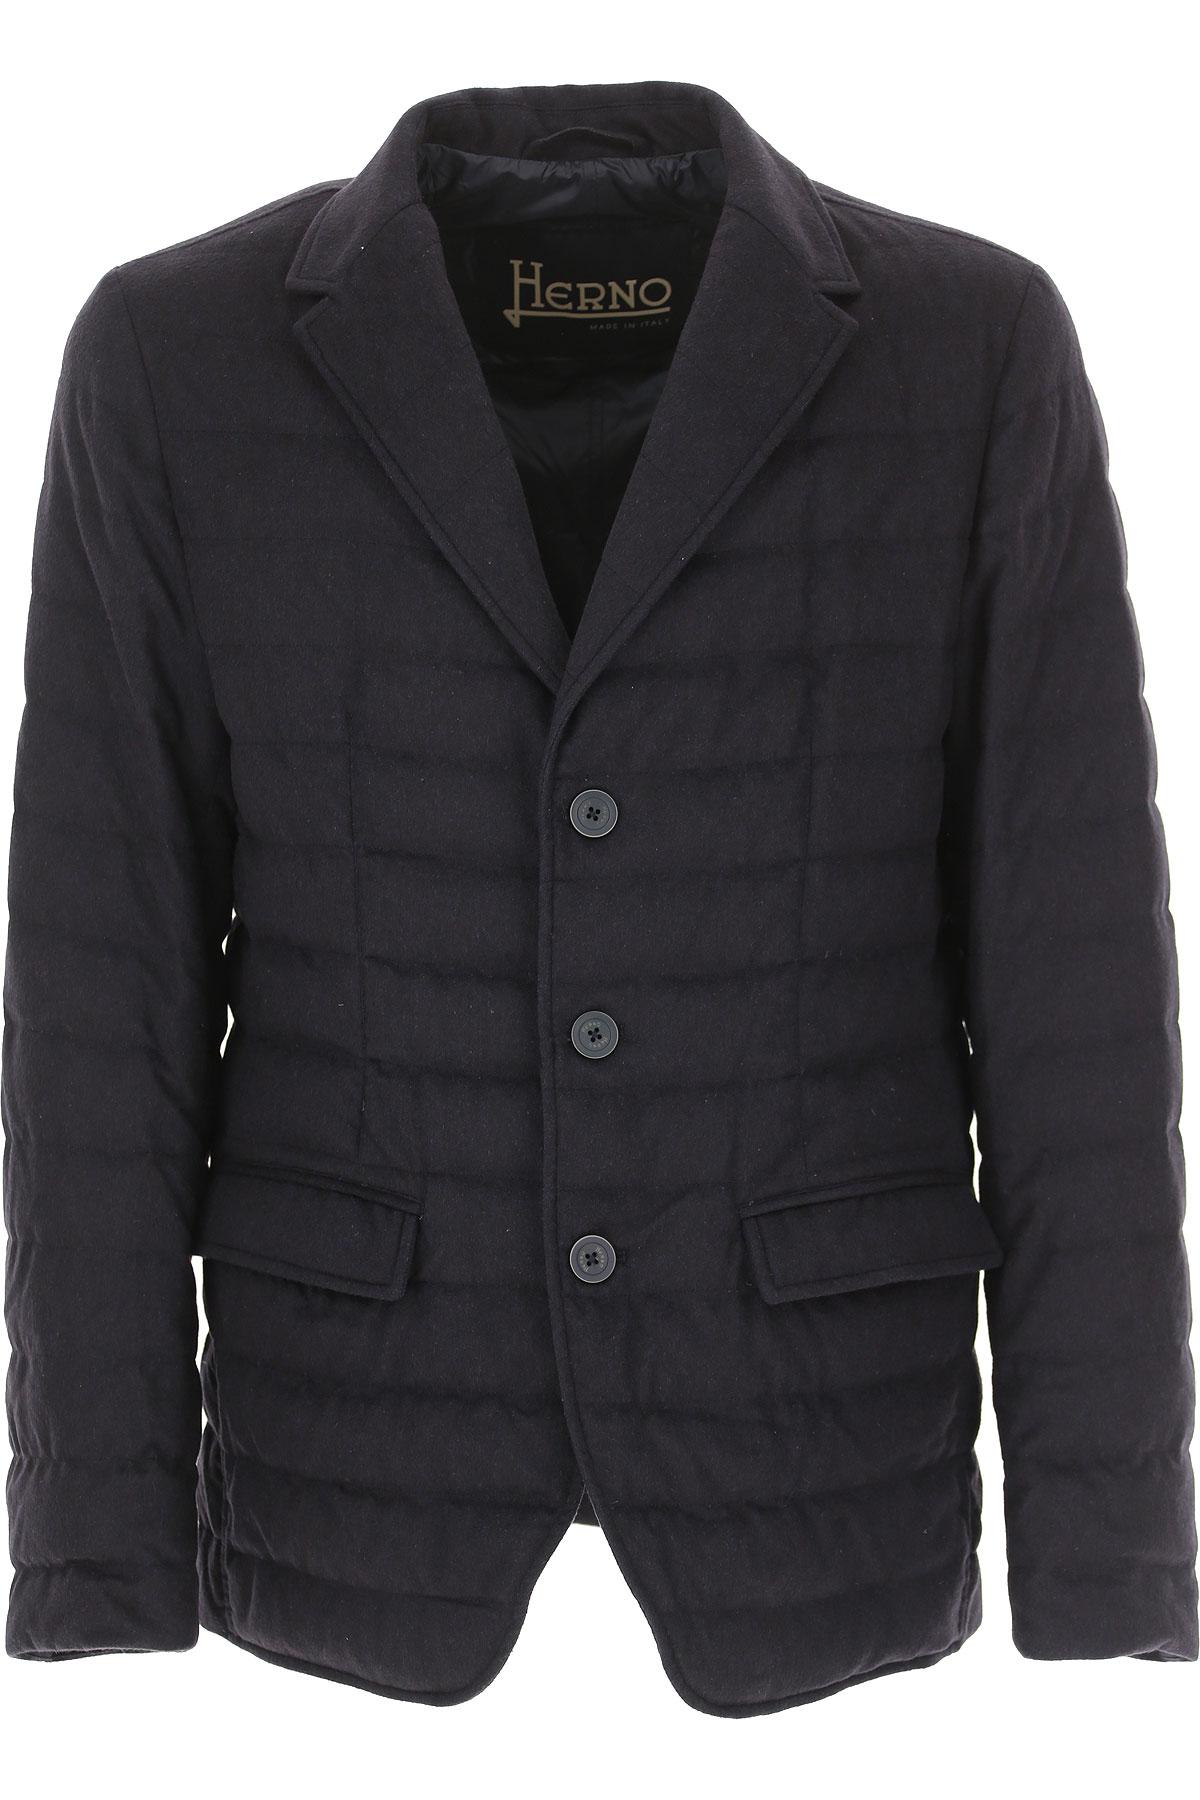 Herno Down Jacket for Men, Puffer Ski Jacket On Sale, Navy Blue, Down, 2019, XL XXL